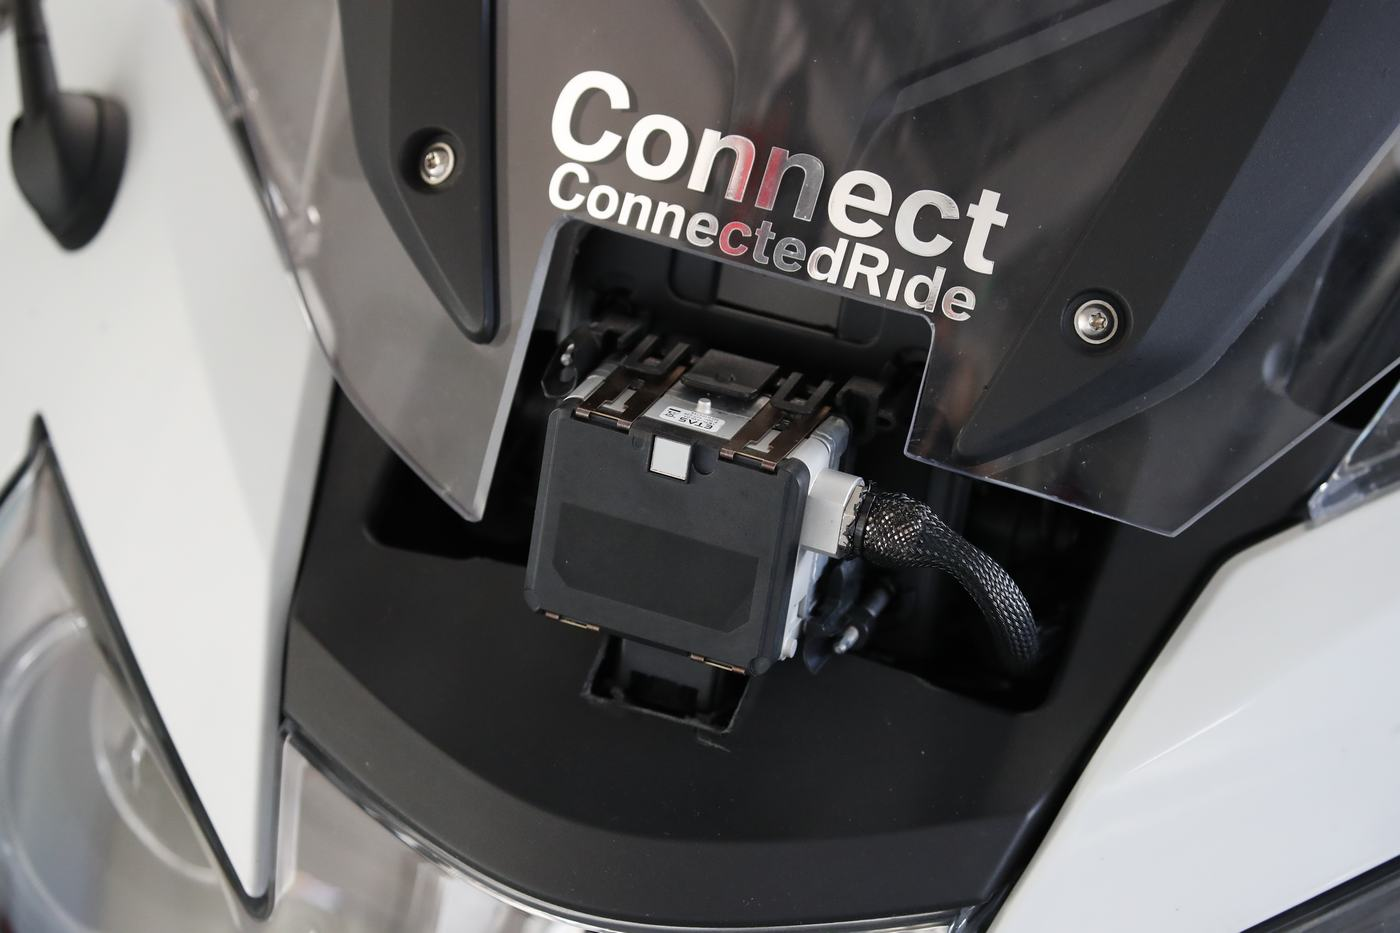 Kendi Kendine giden R1200GS Connected Ride